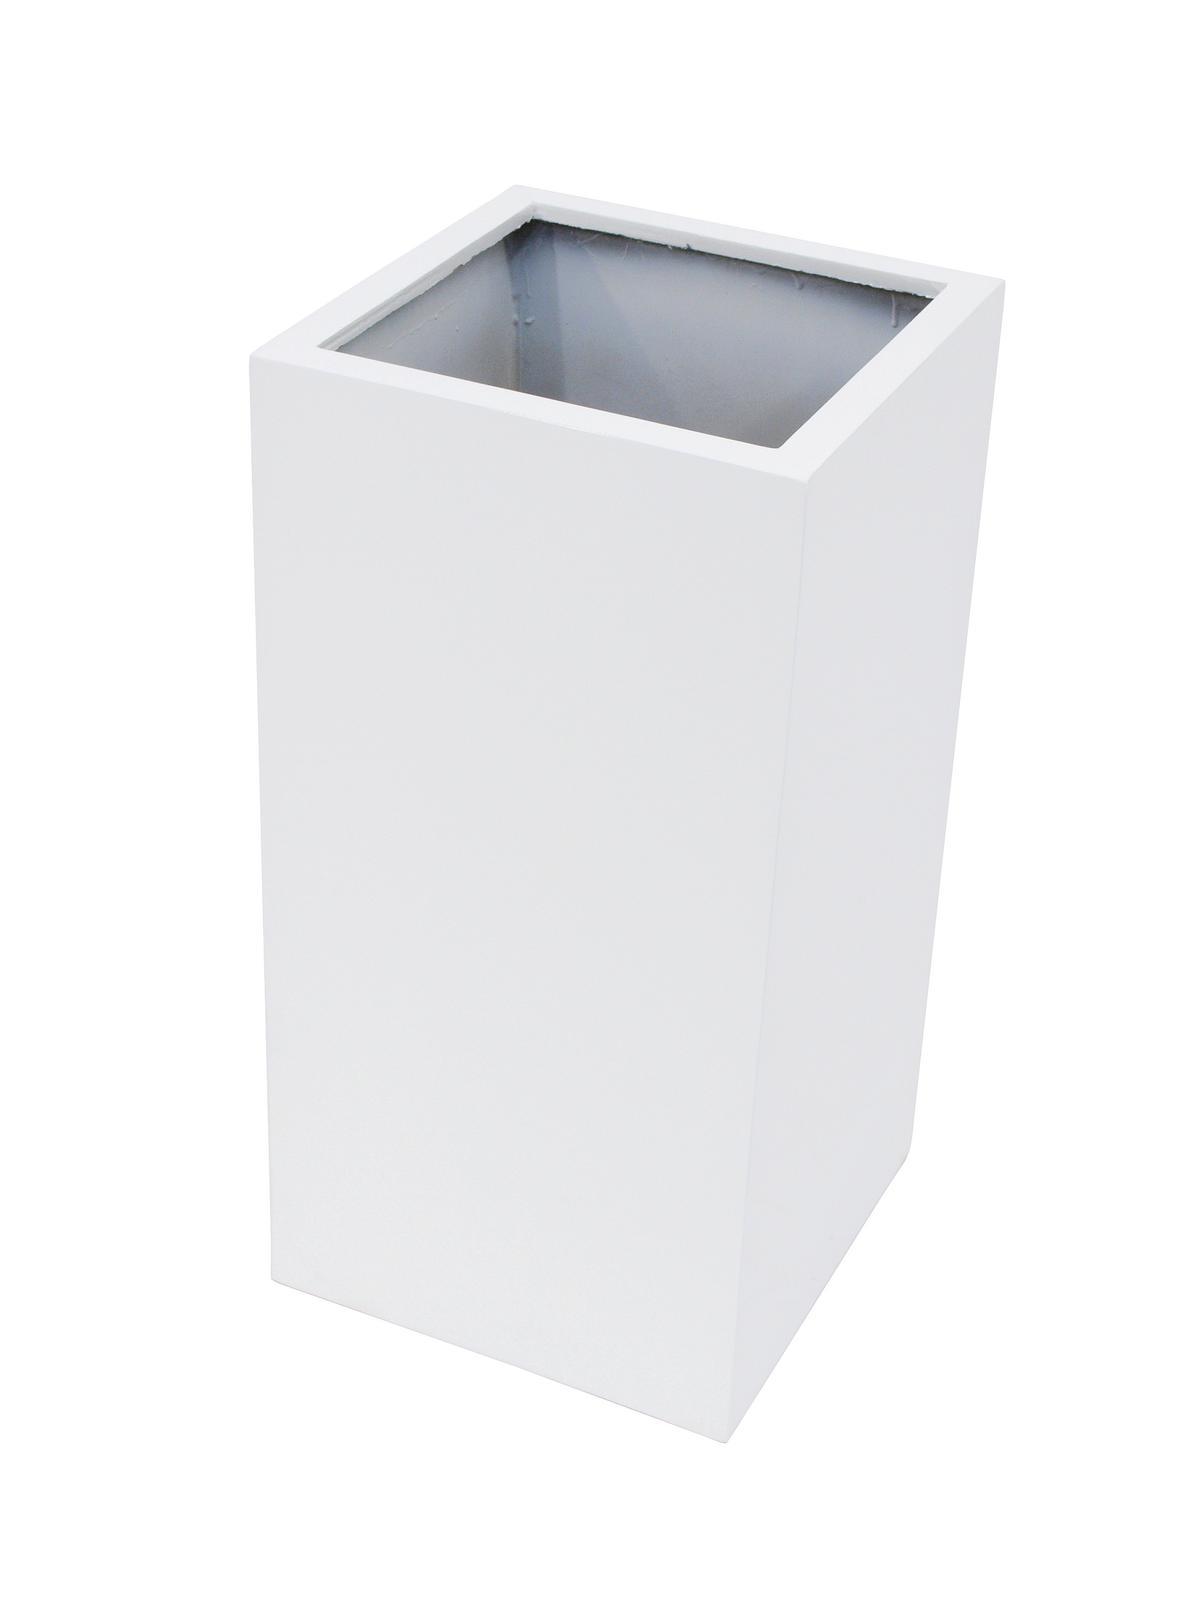 EUROPALMS LEICHTSIN BOX-80, lucido-bianco